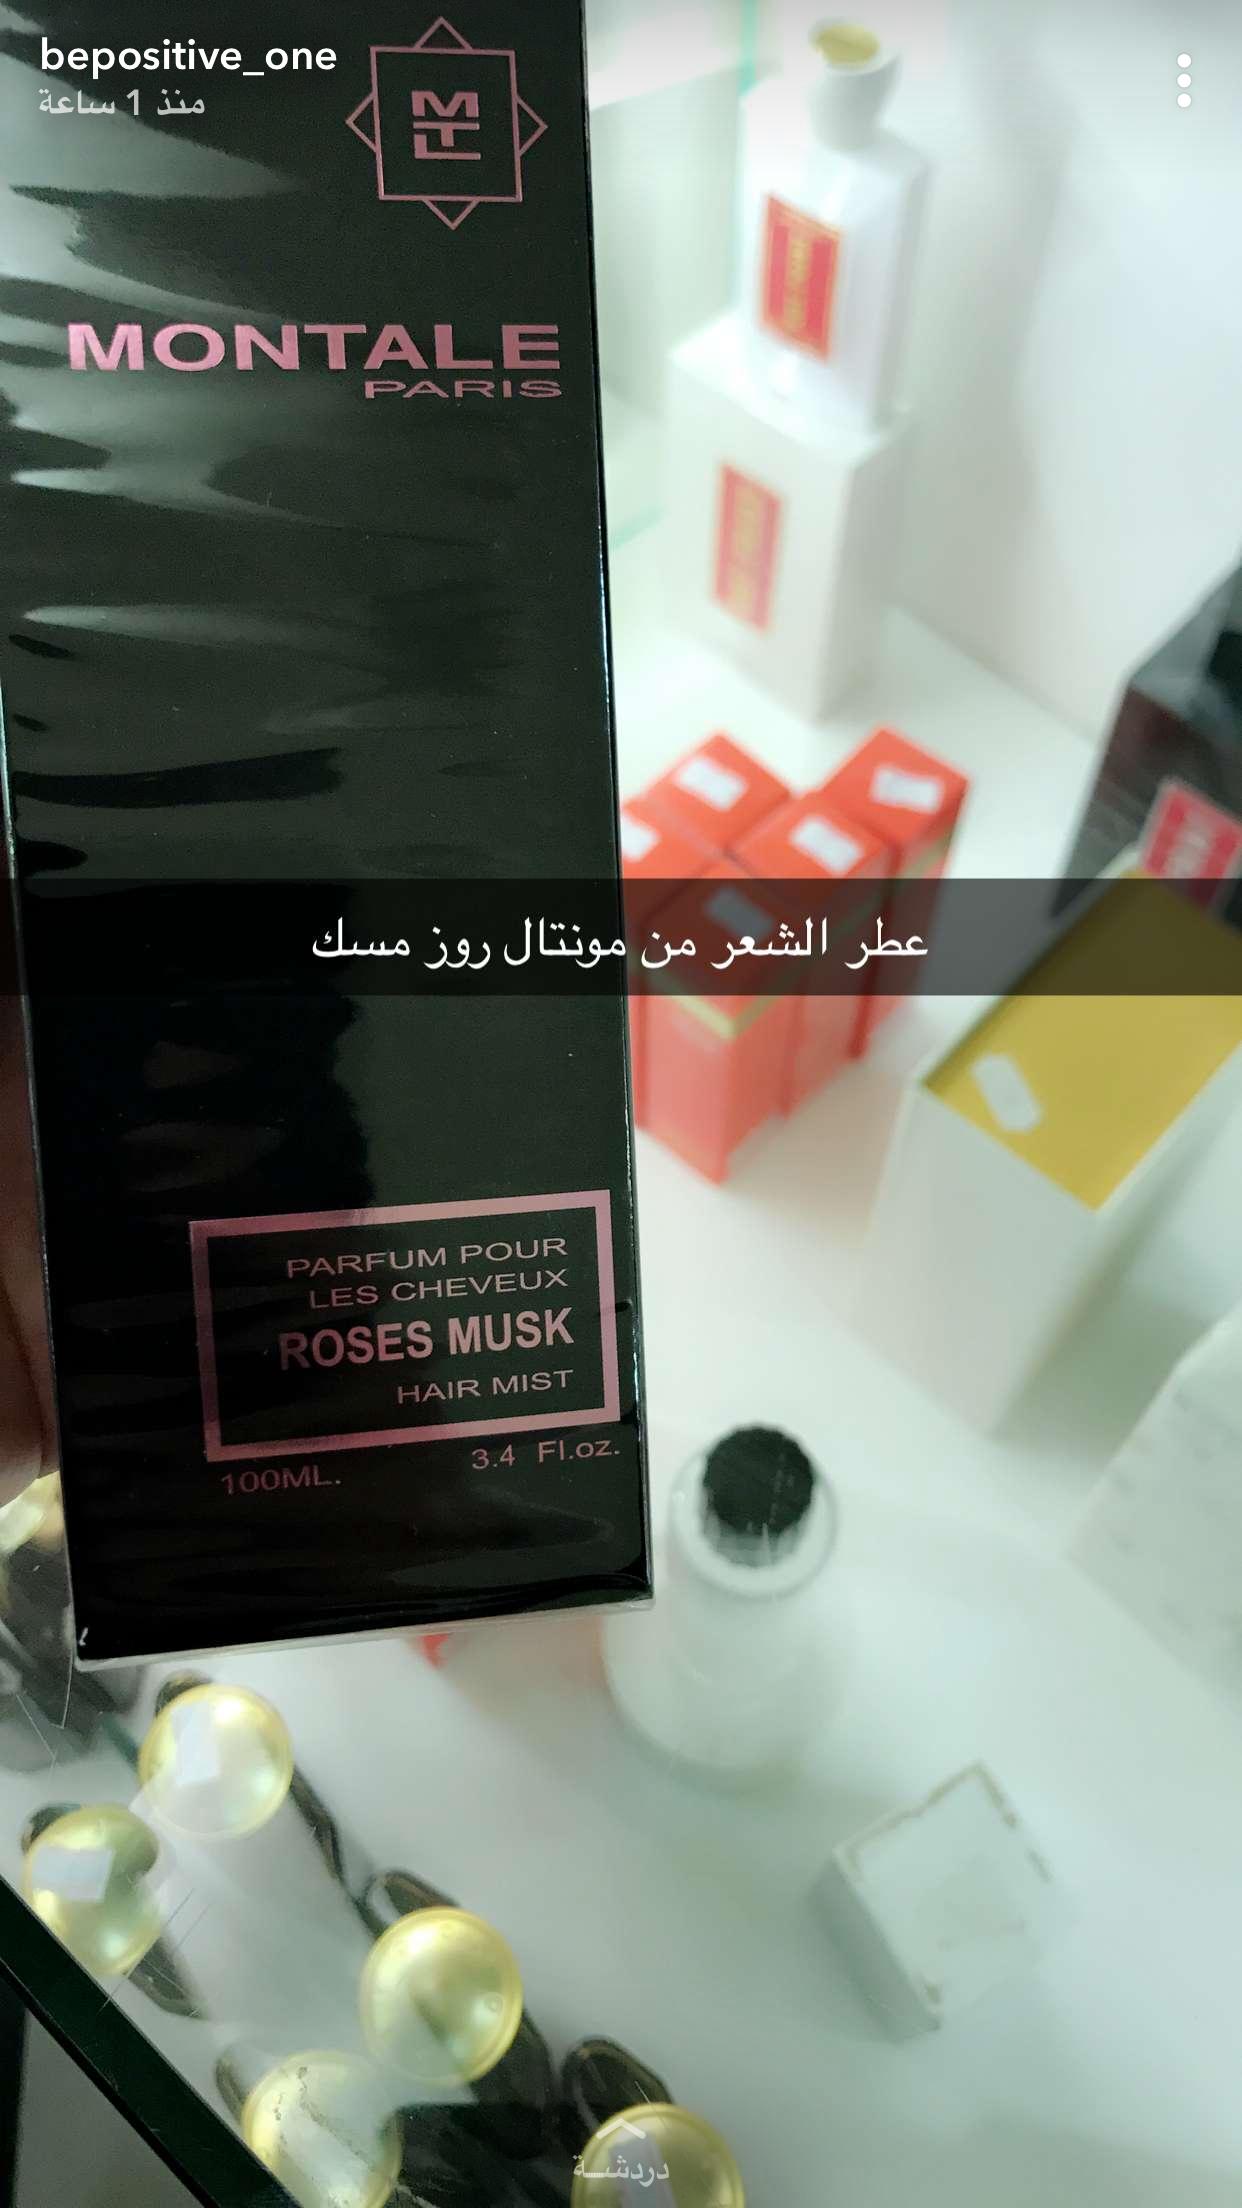 Pin By Abeer198637 On أزياء وأناقة Feminine Fragrance Perfumery Perfume